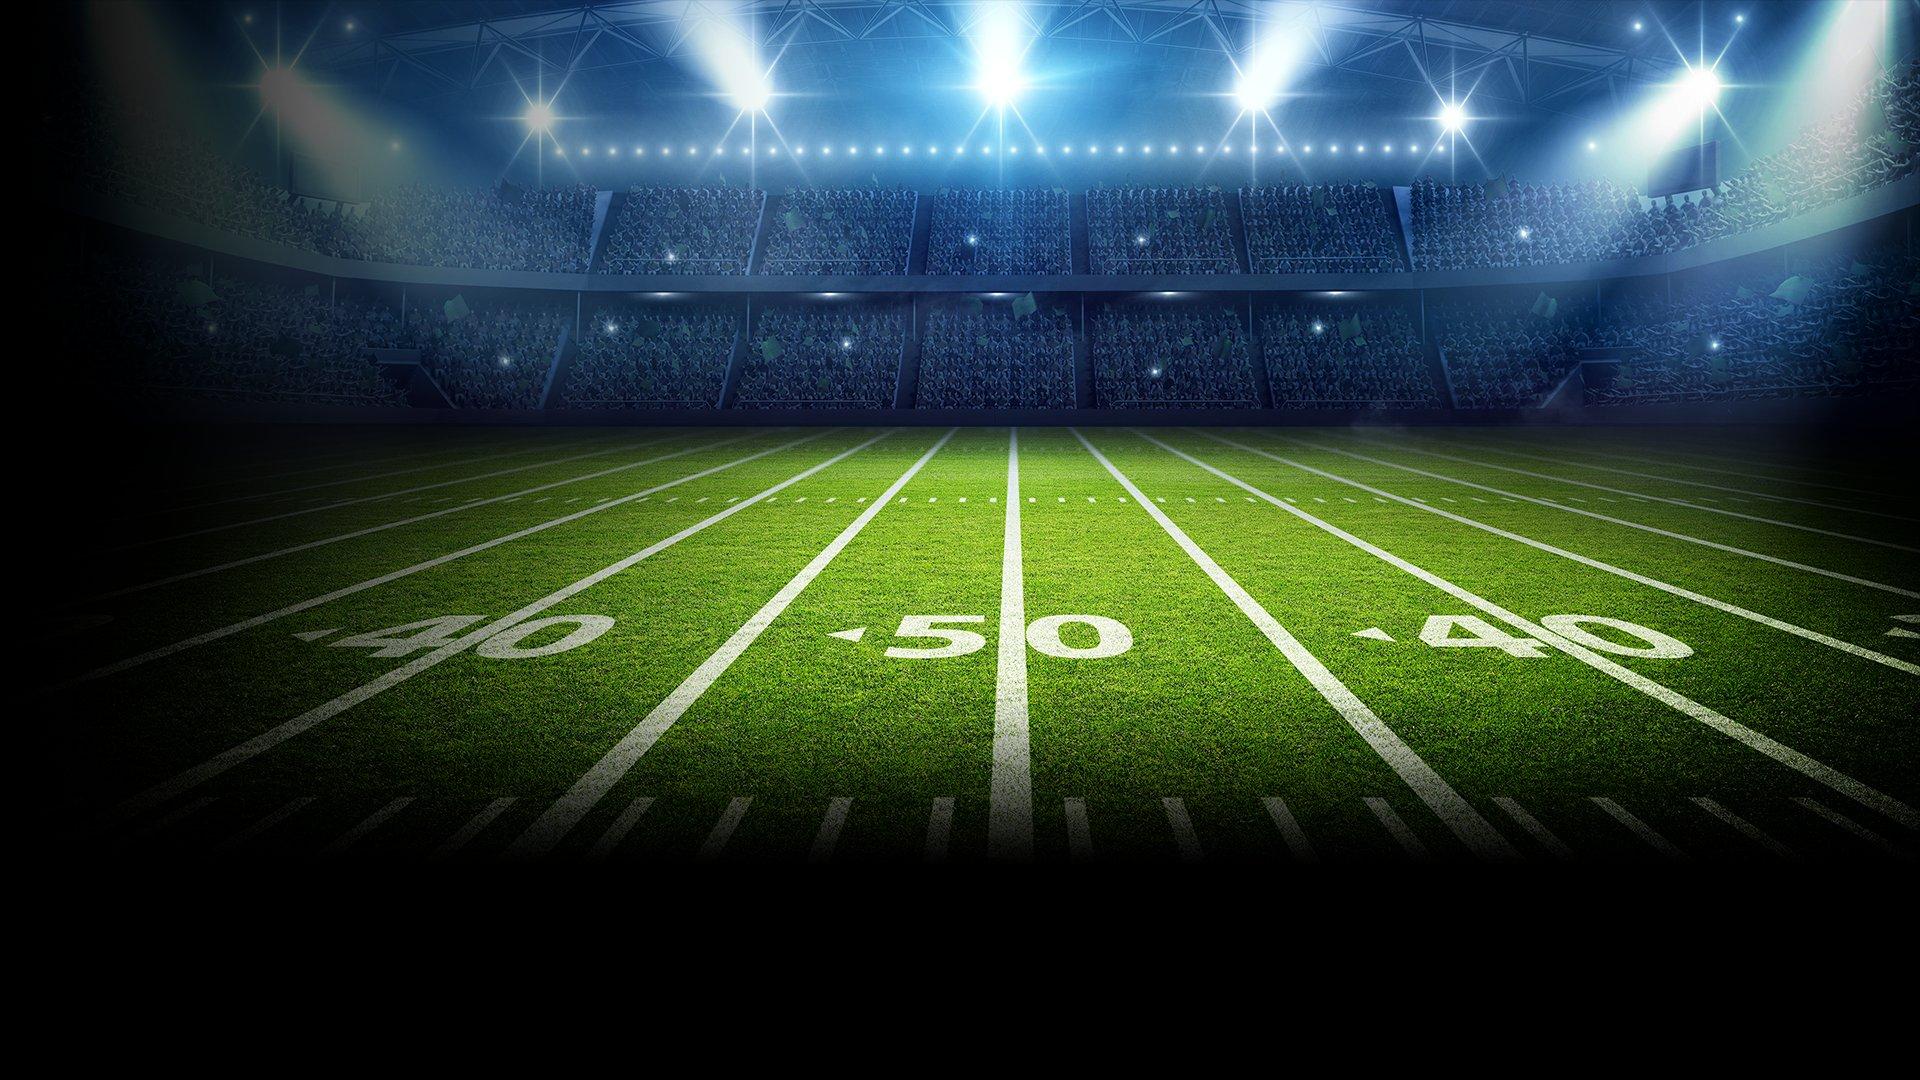 fond Super Bowl